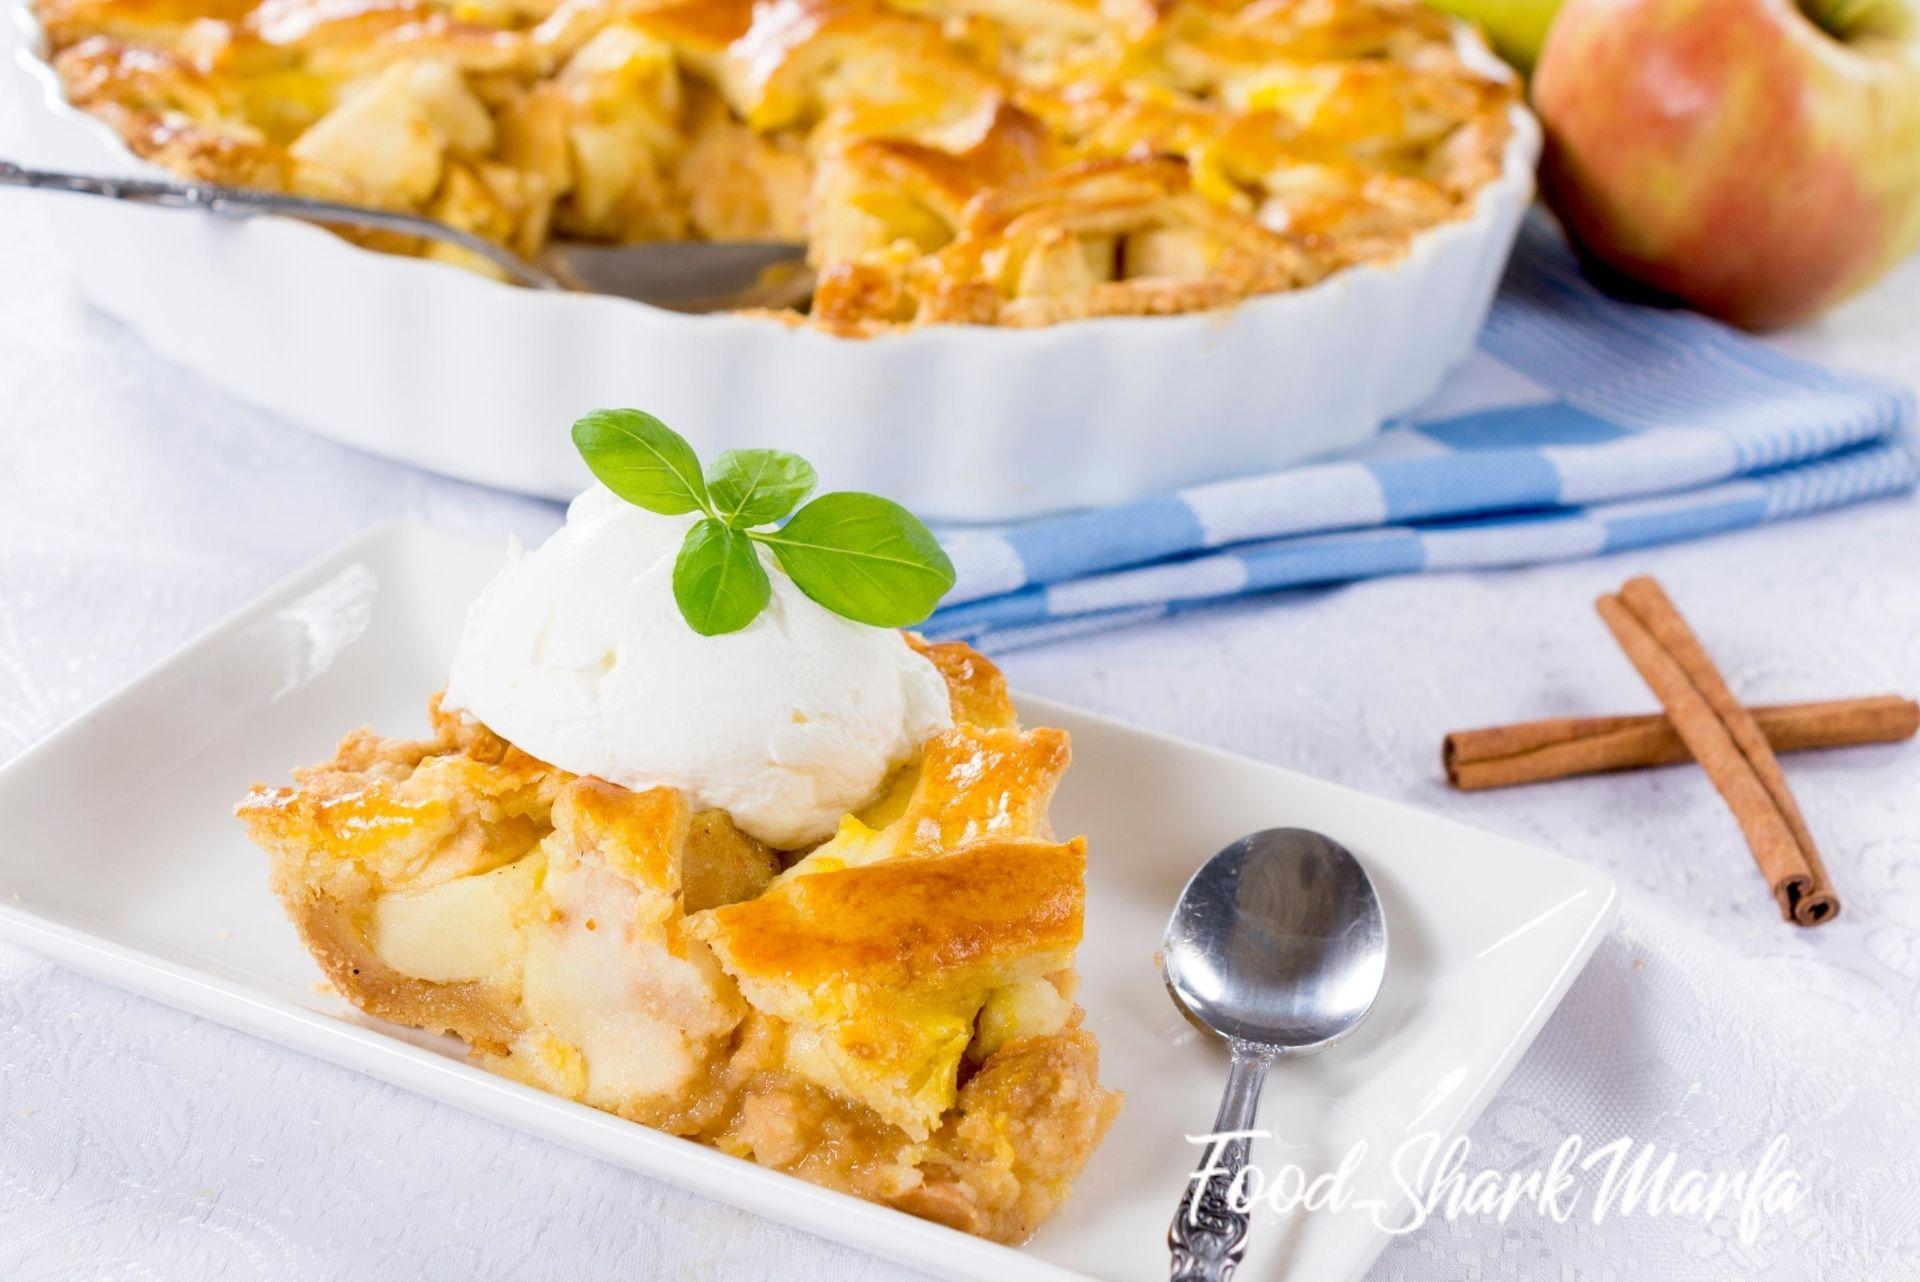 Taty apple pie